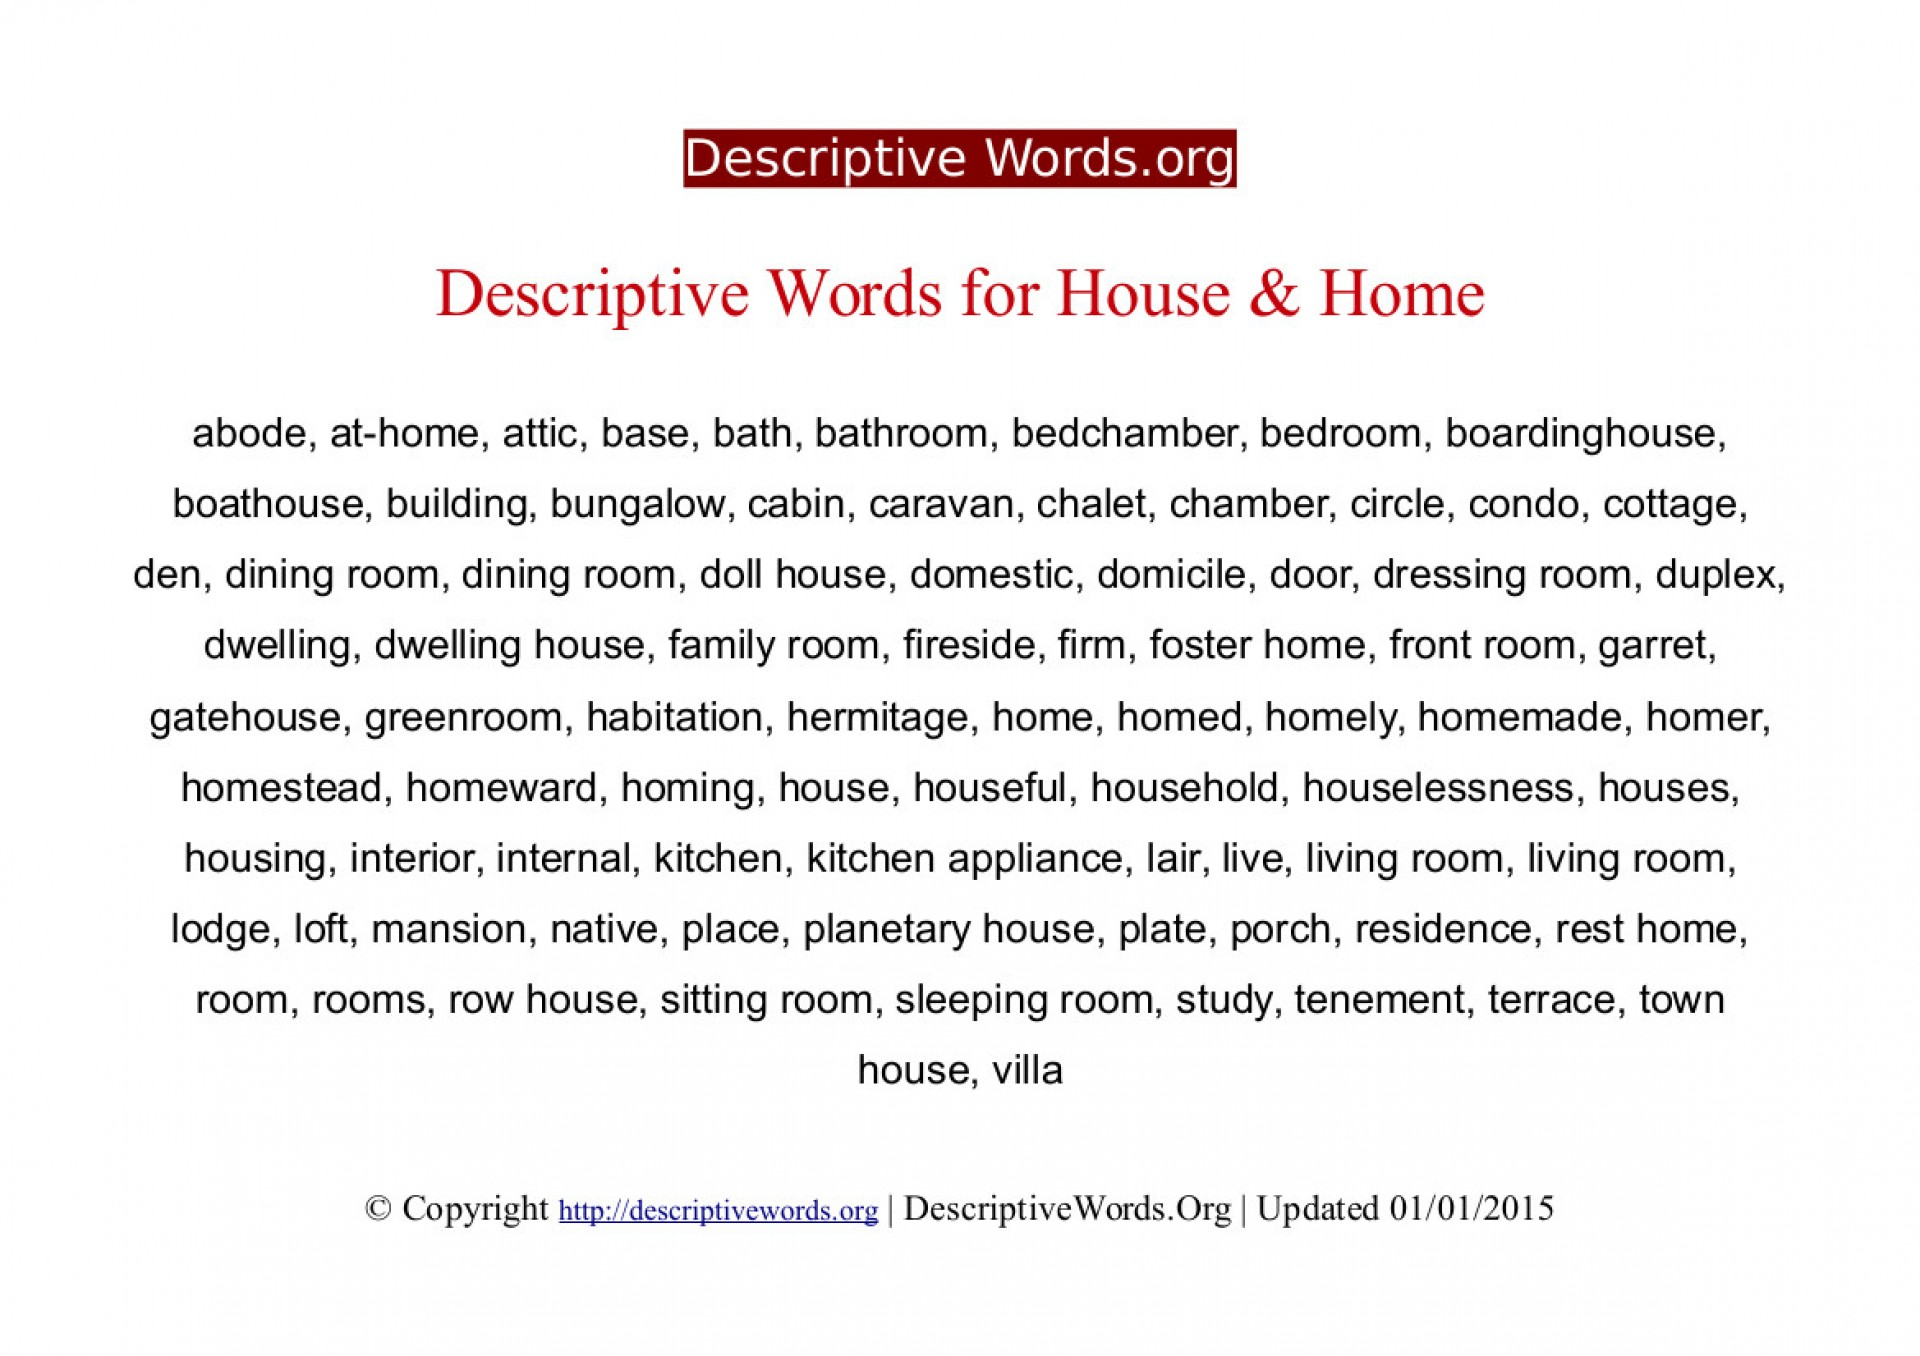 002 Descriptivewords For Home Descriptive Essay Beautiful Describing Sweet Ideal 1920